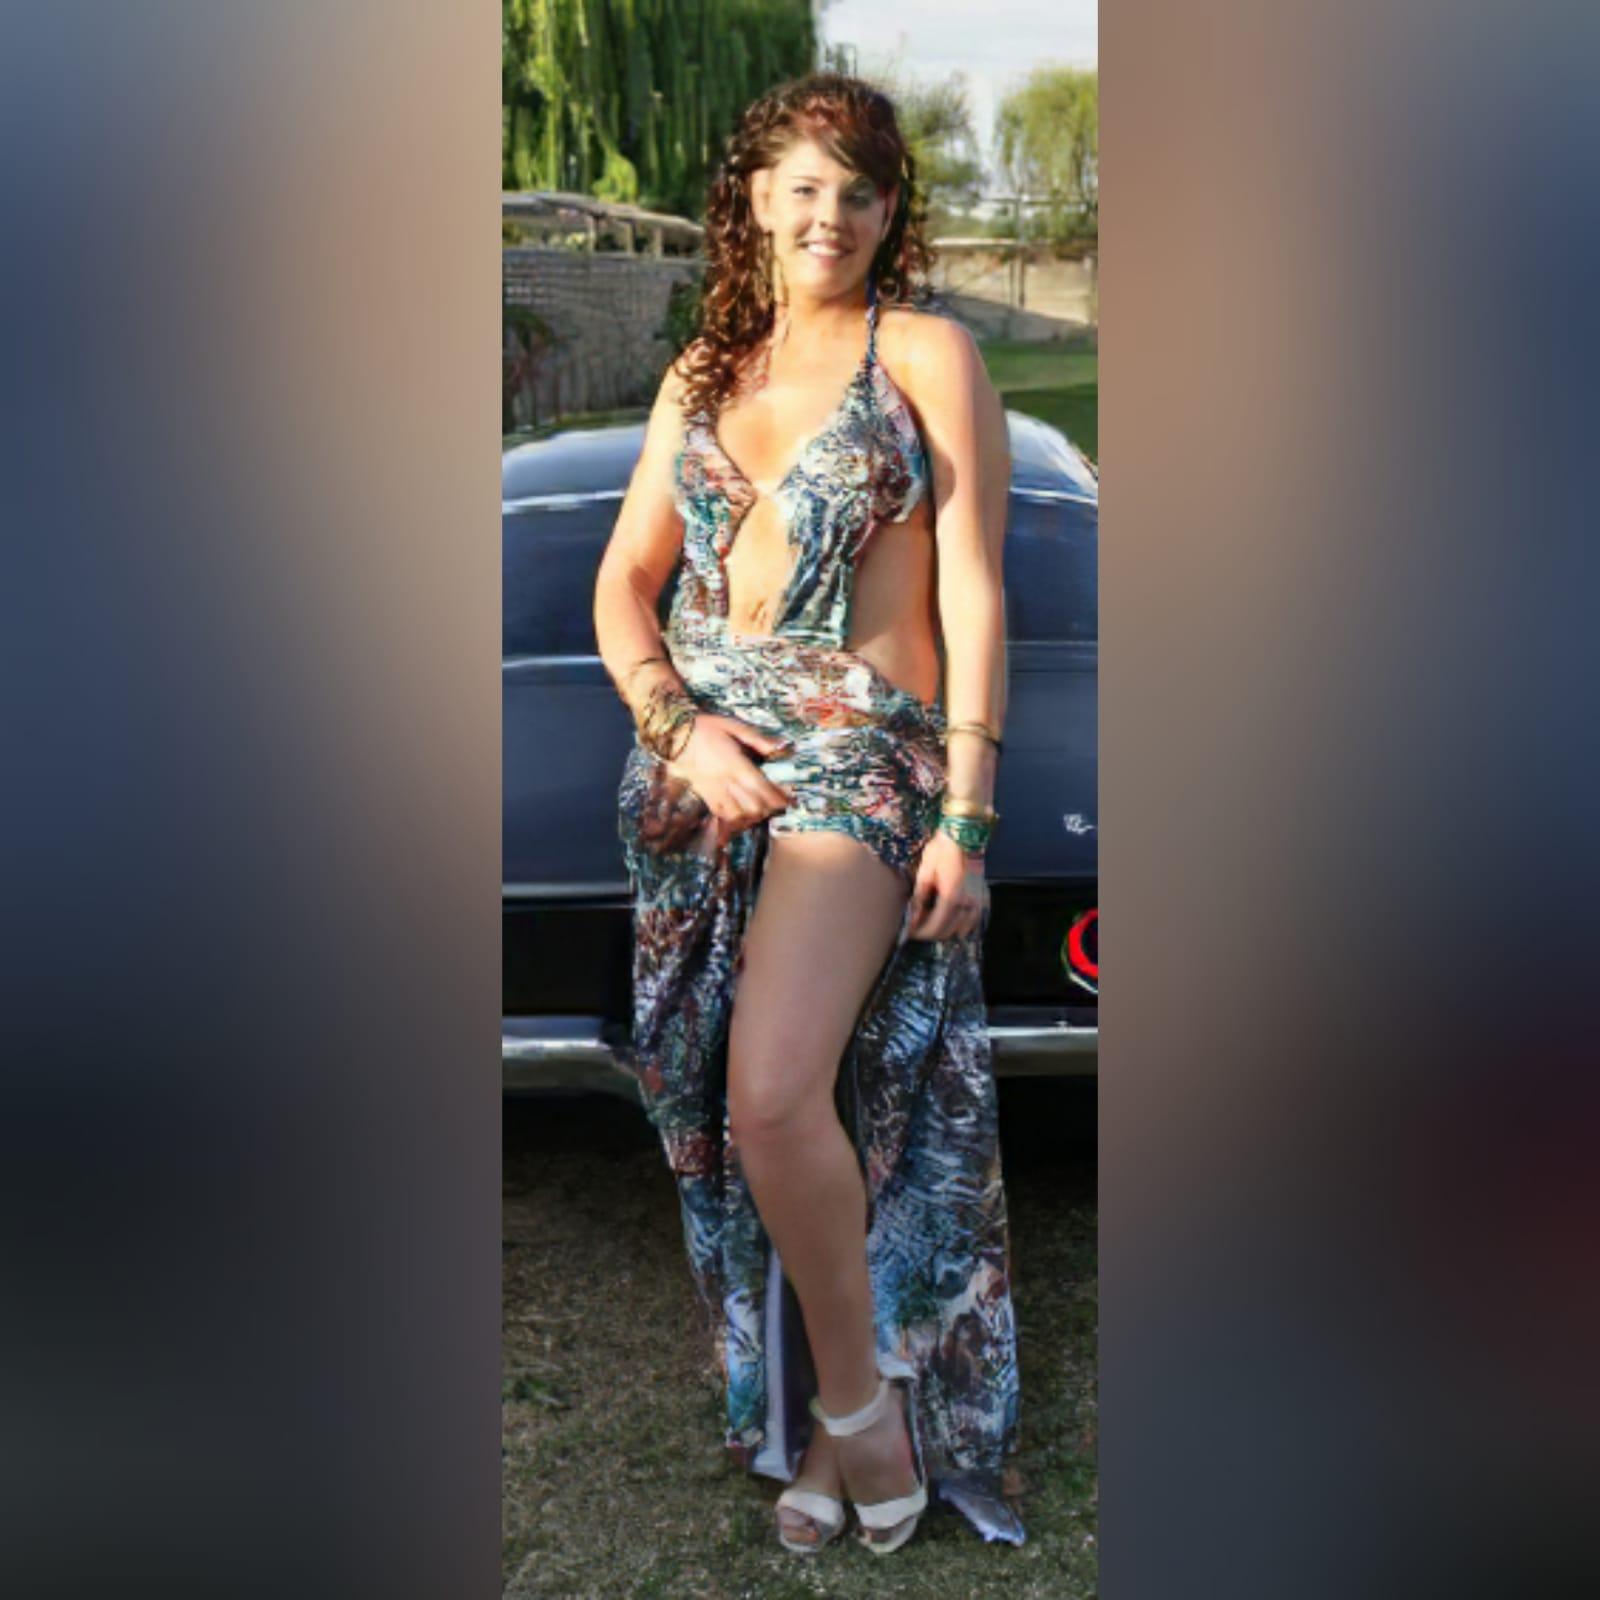 Vestido de finalistas estampado sexy 1 vestido de finalistas estampado sexy, decote profundo com as costas nuas e uma cauda